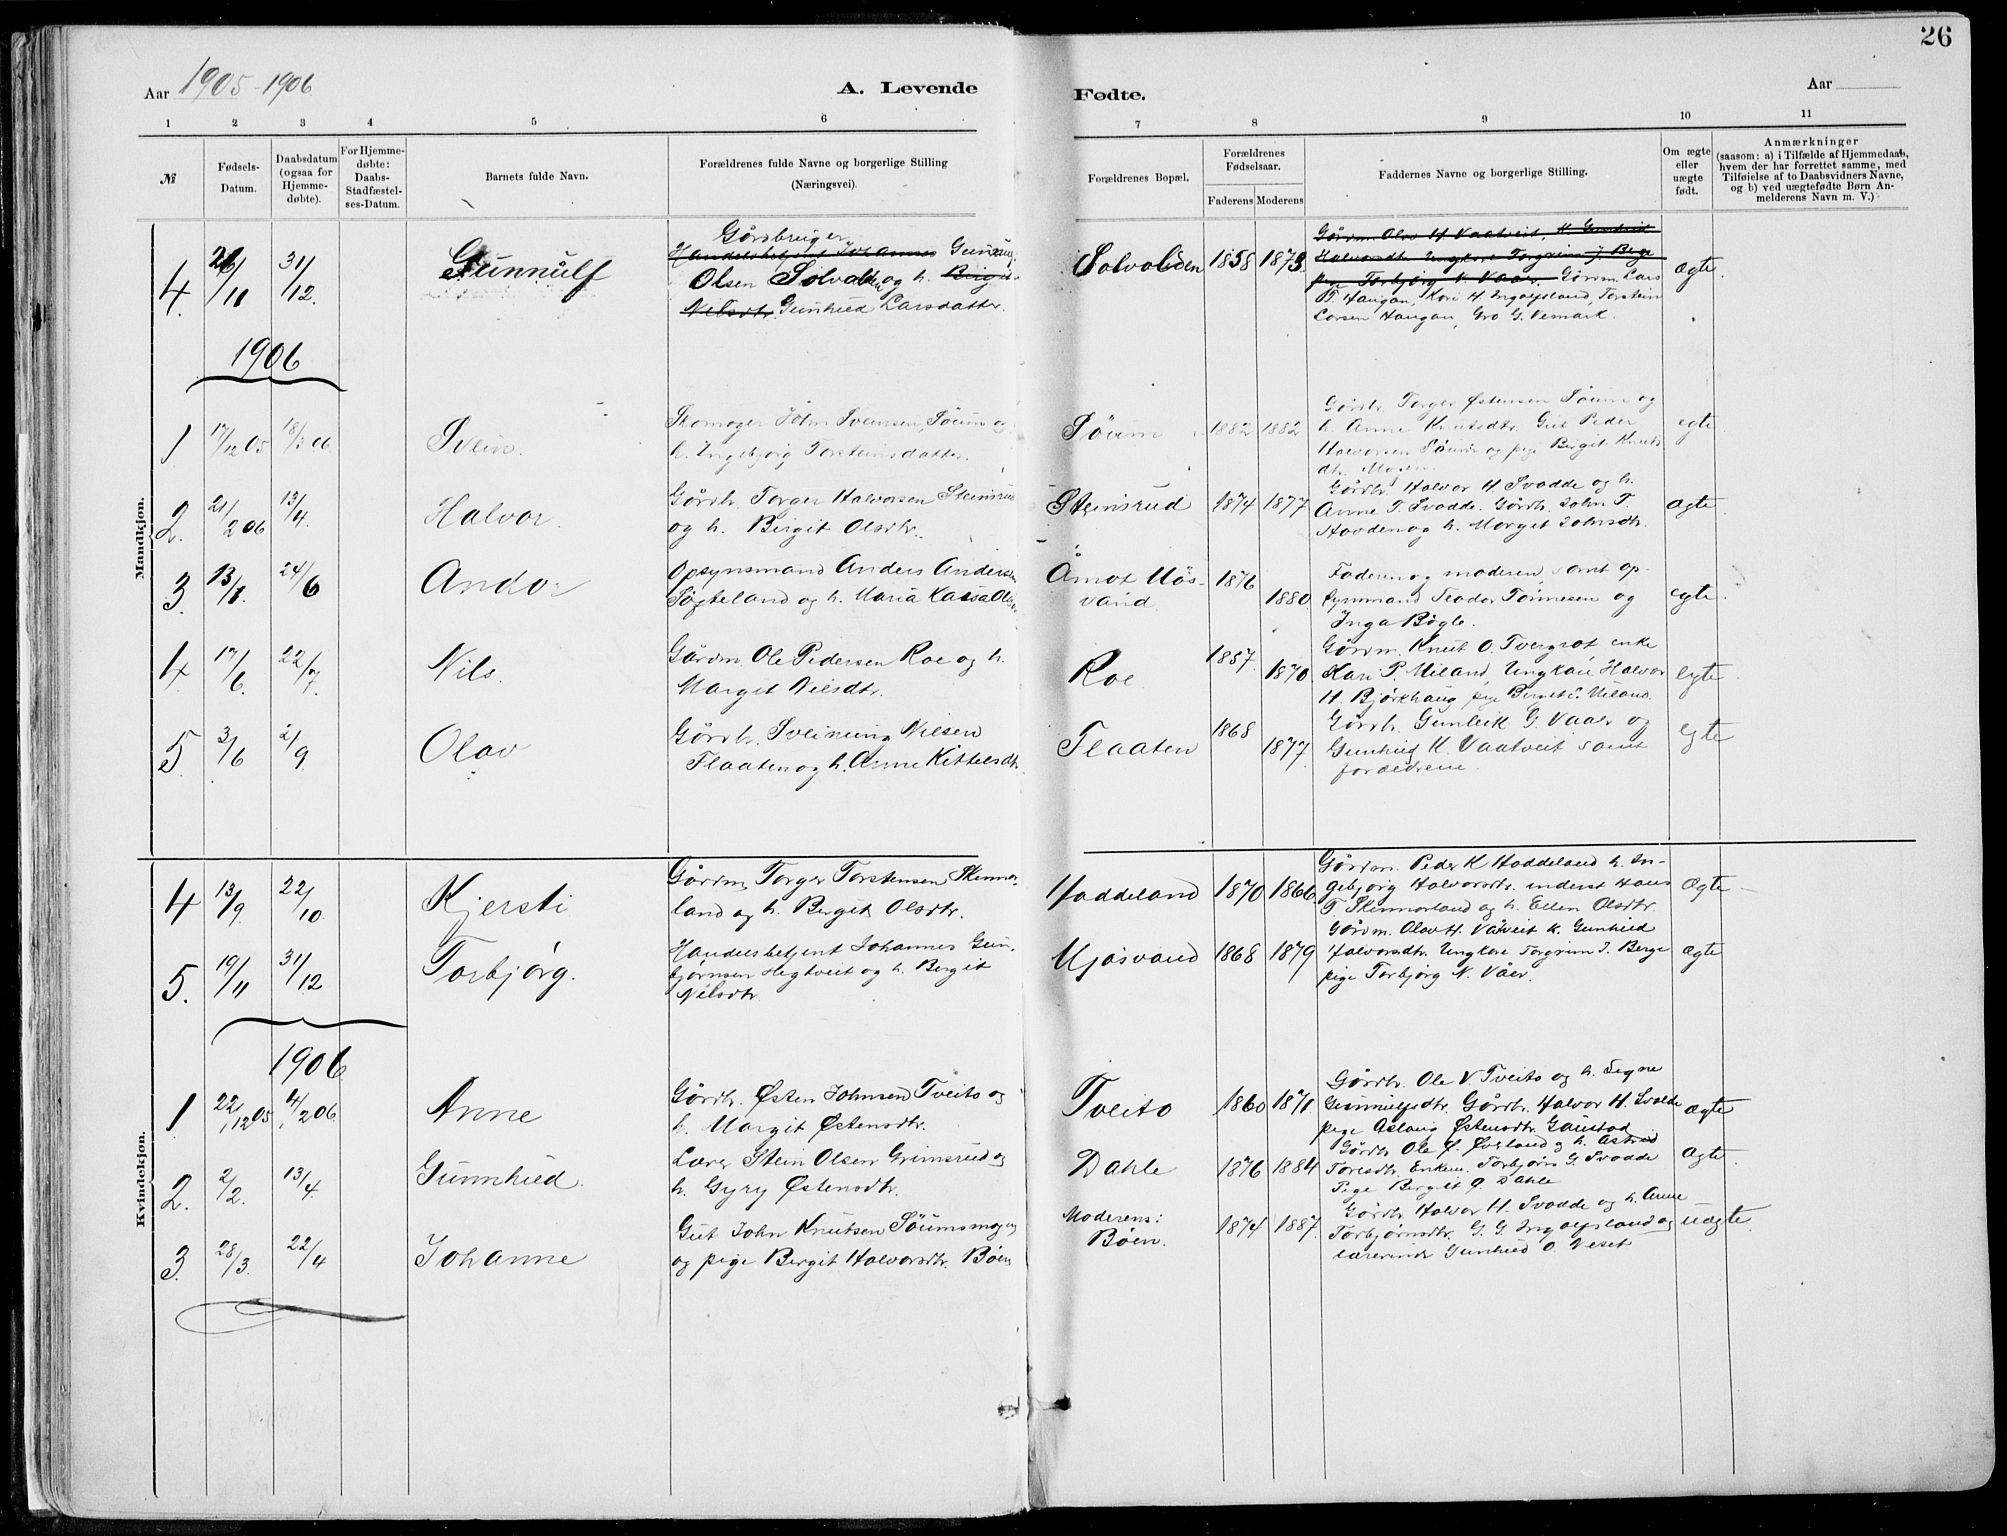 SAKO, Rjukan kirkebøker, F/Fa/L0001: Ministerialbok nr. 1, 1878-1912, s. 26